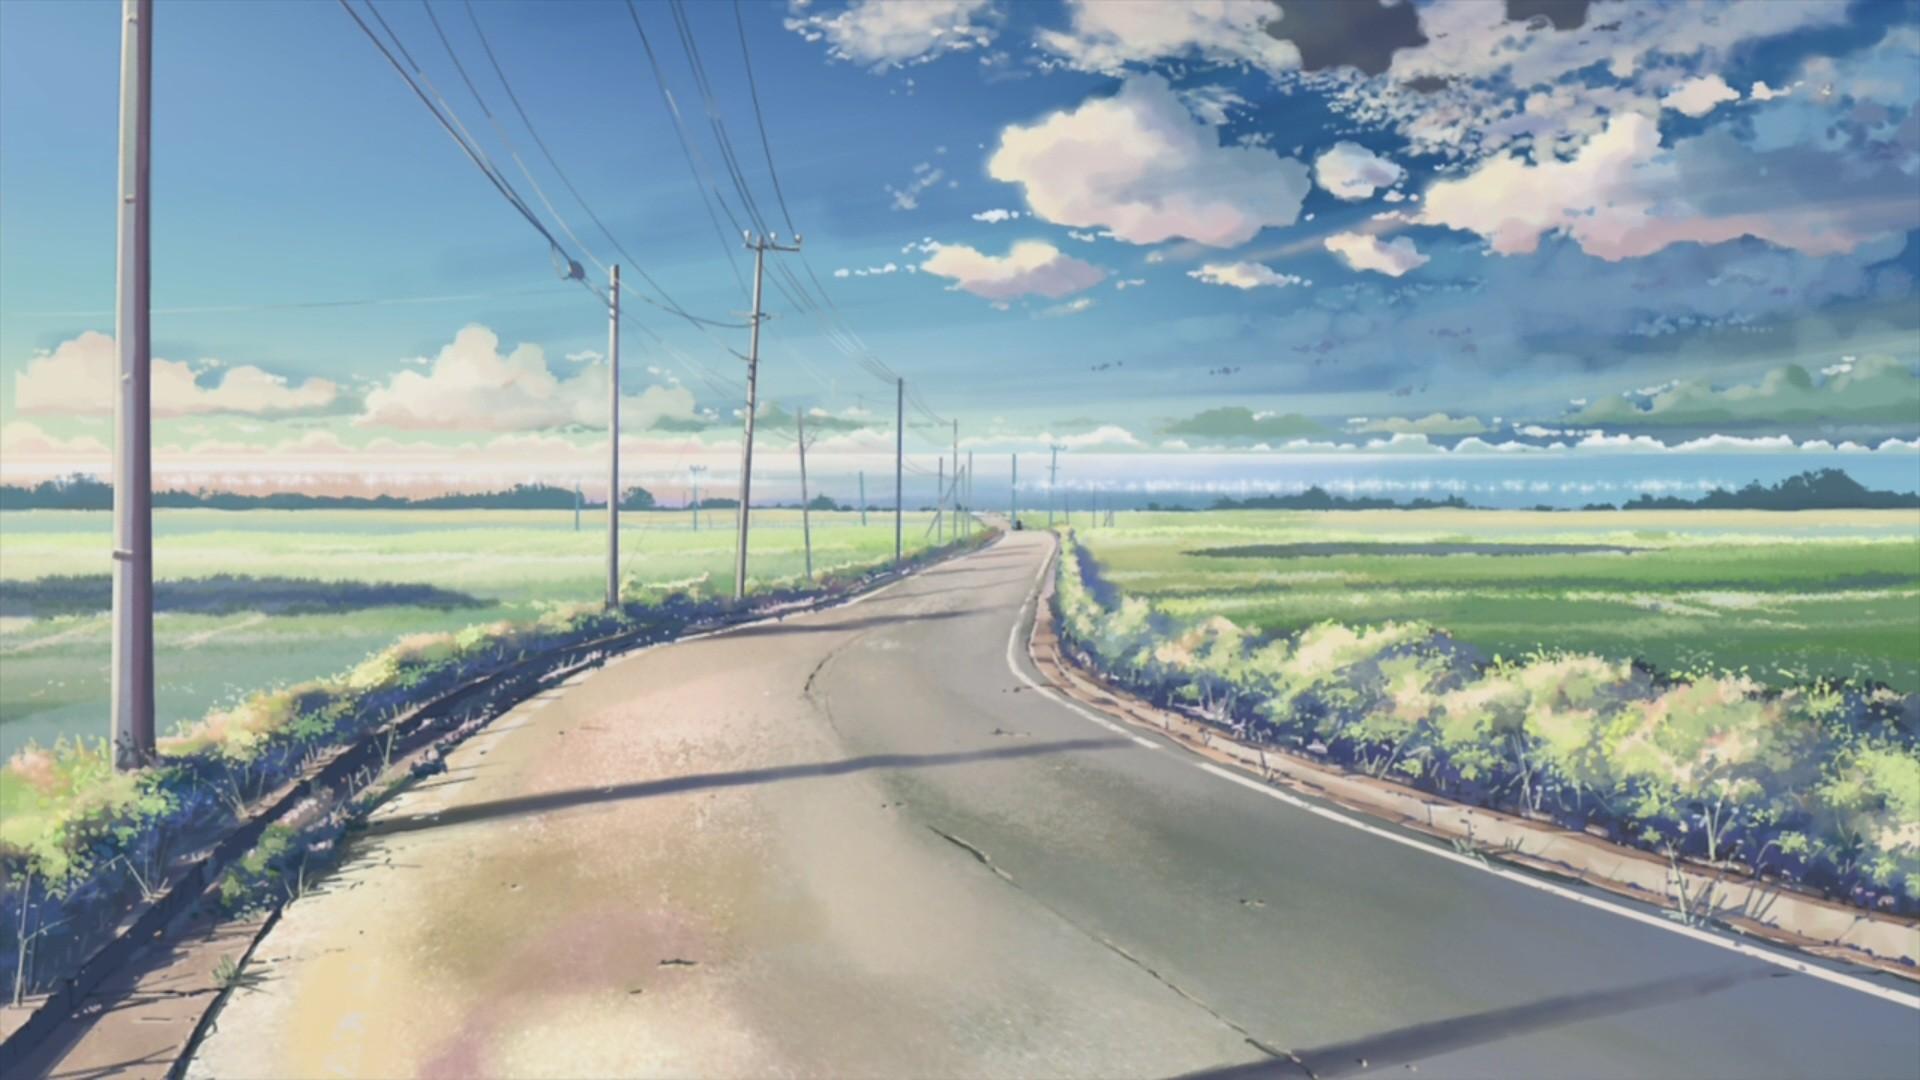 still a long way to go · Scenery WallpaperWallpaper BackgroundsWallpapersAnime  …